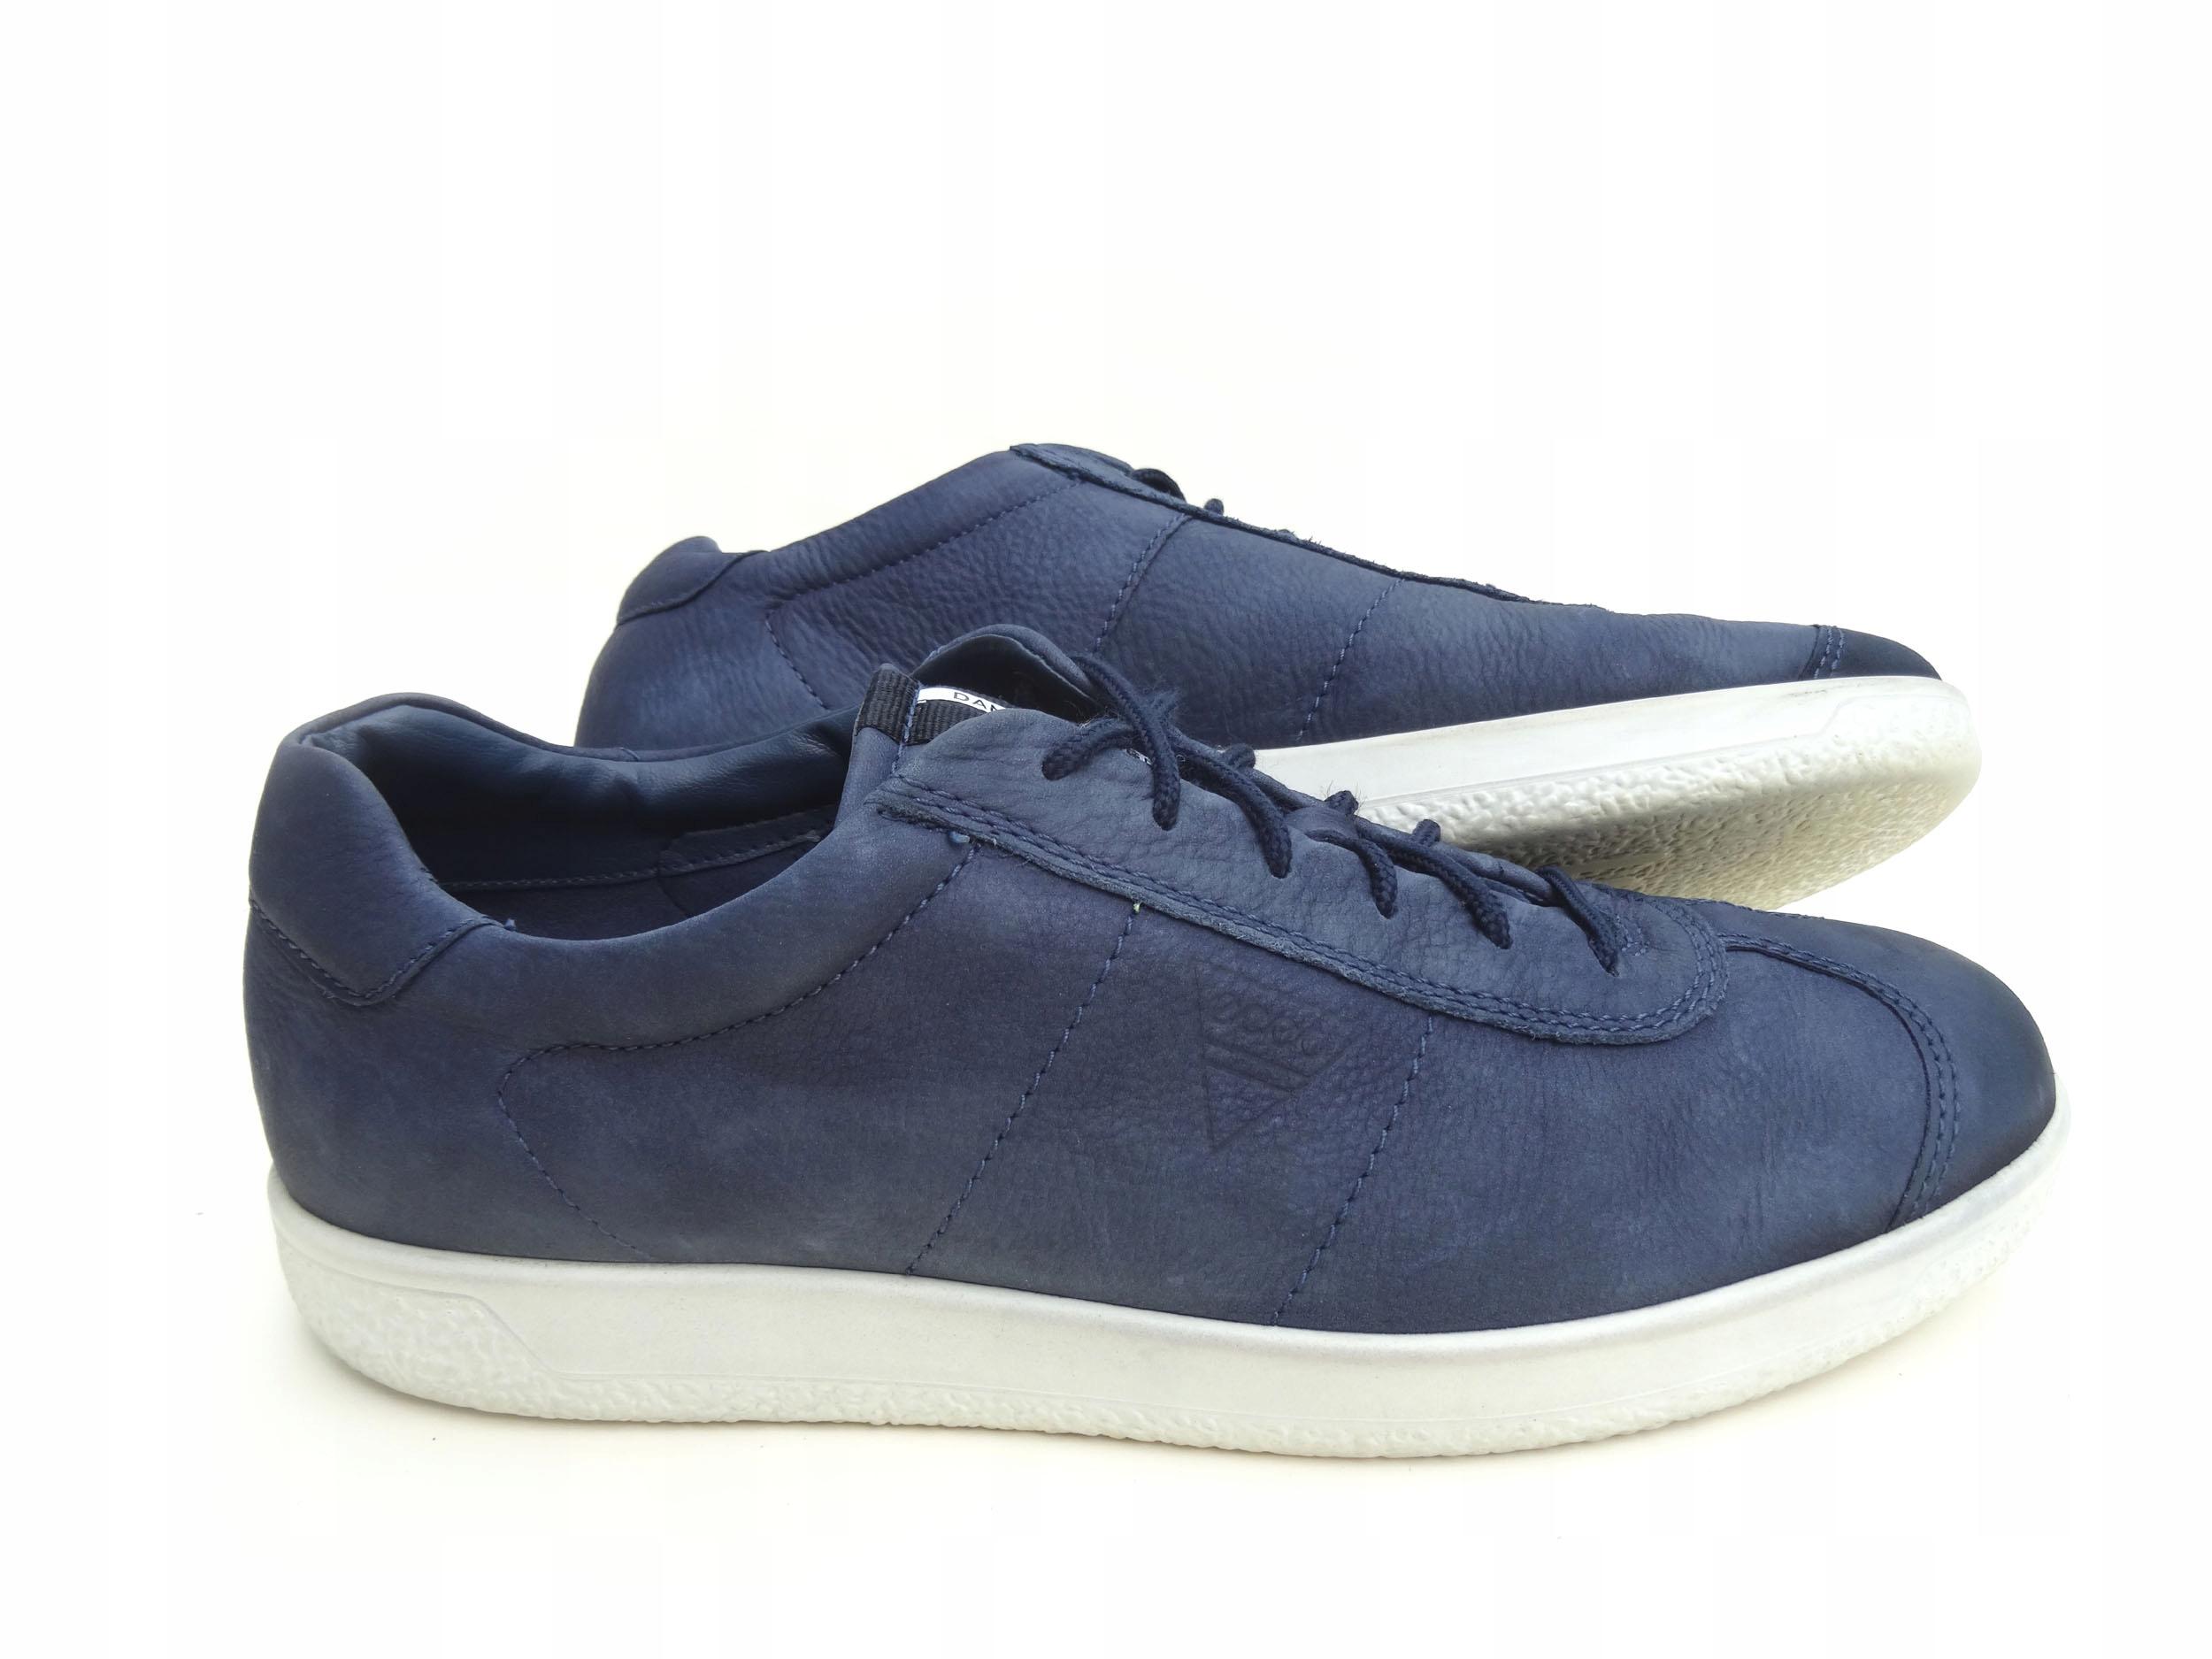 ECCO SOFT 1 DANISH DESIGN Sneaker półbuty BDB 44